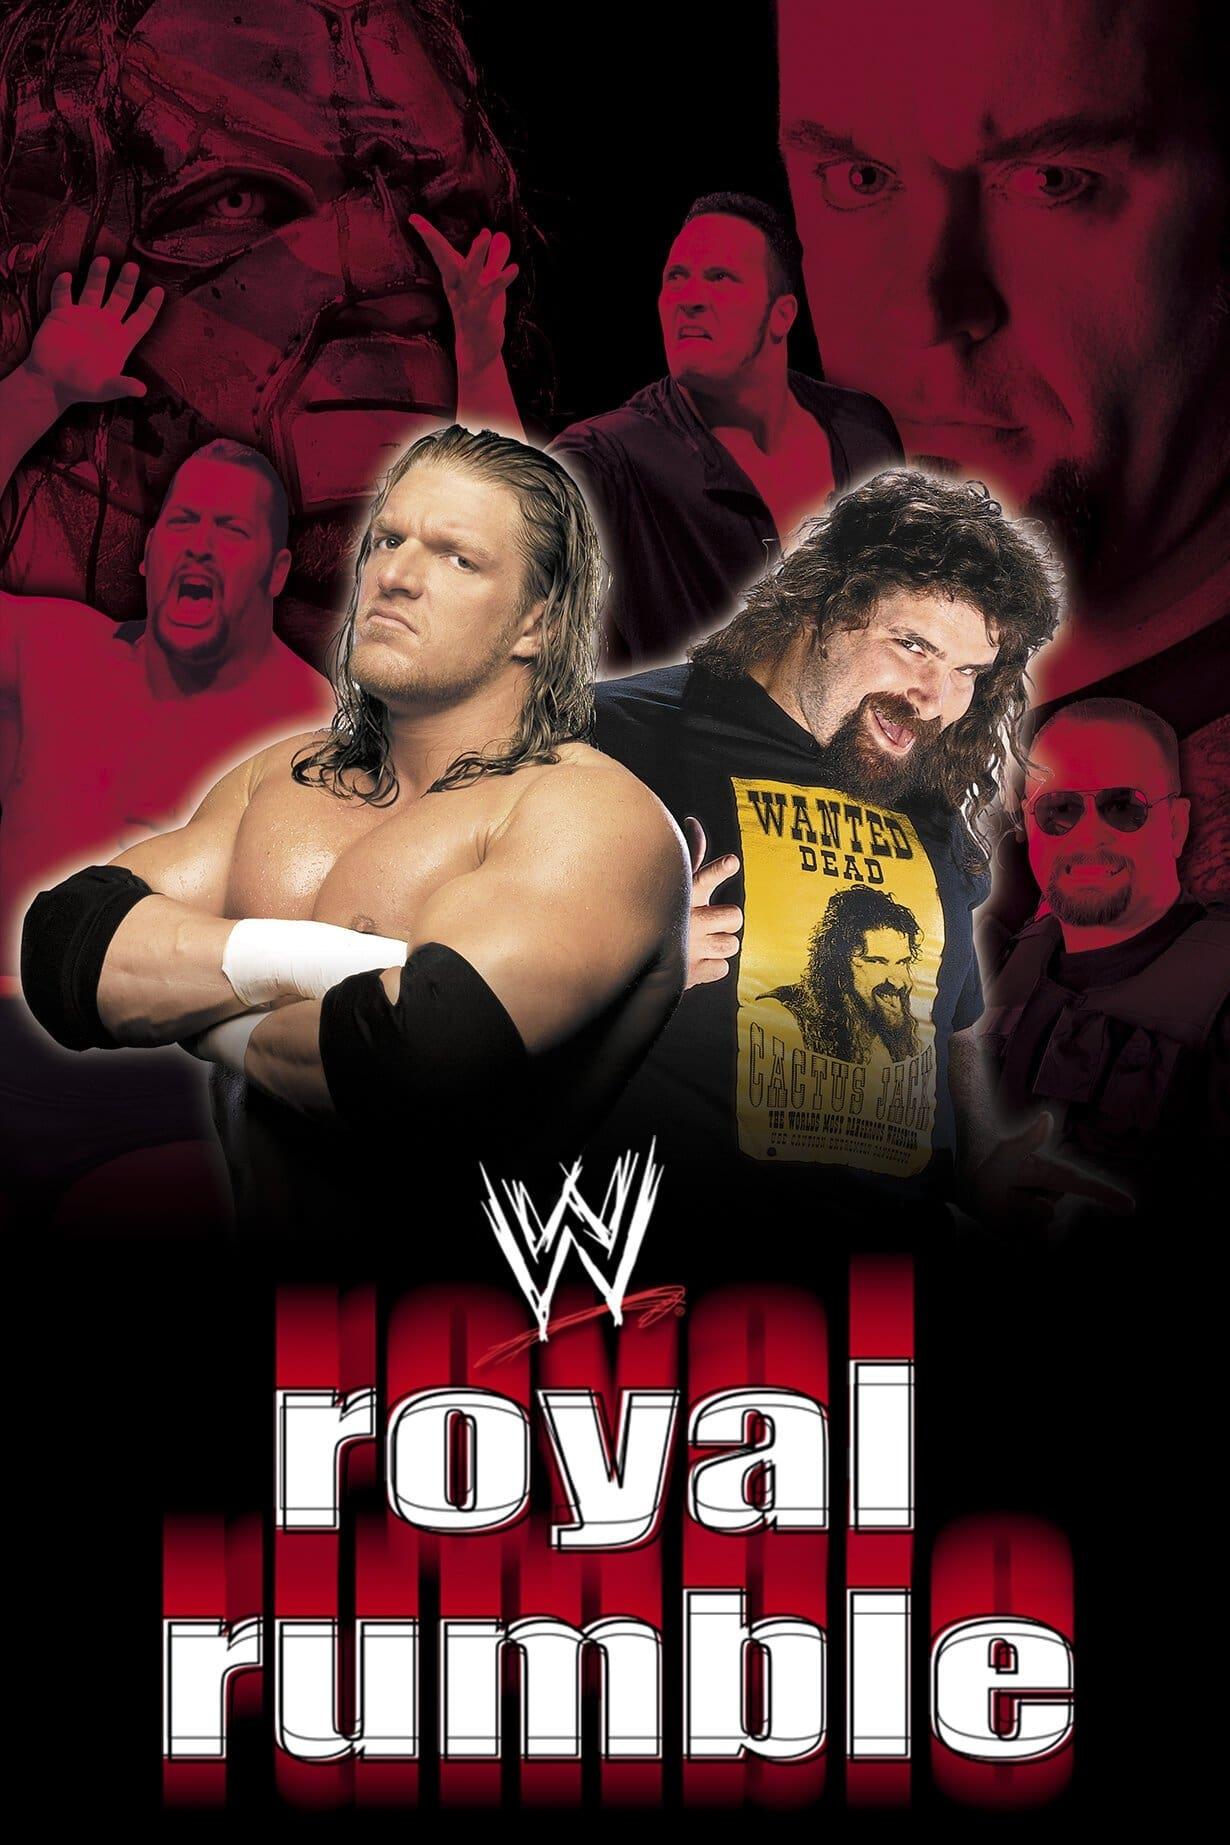 WWE Royal Rumble 2000